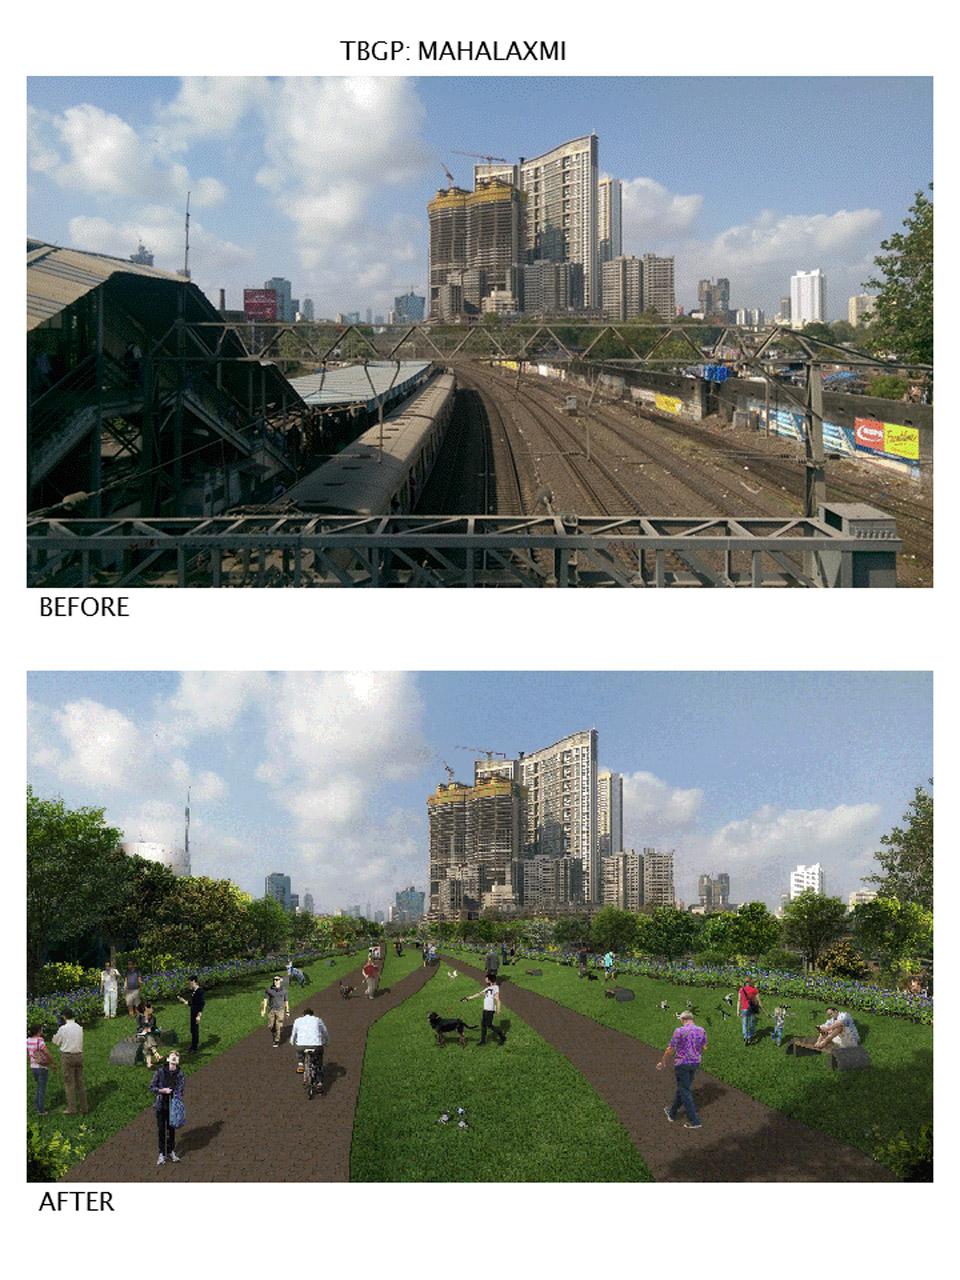 AJA TBGP Mahalaxmi_Comparison Before and After.jpg